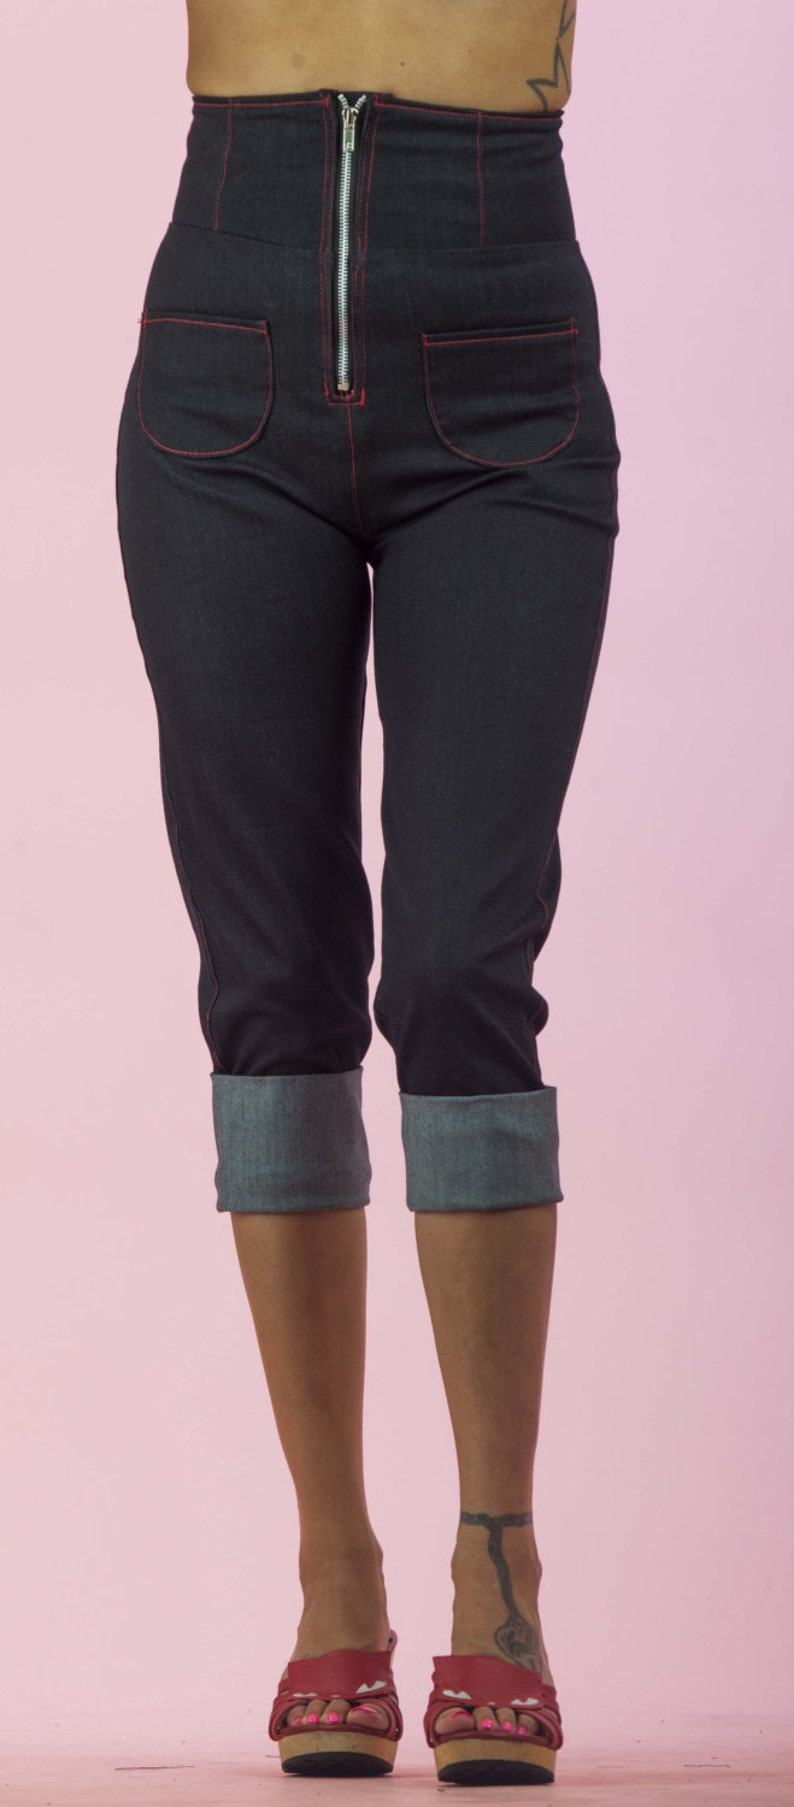 1950s Pants & Jeans- High Waist, Wide Leg, Capri, Pedal Pushers High Waisted Roll Up Capri Pants Retro / Rockabilly / Vintage 50s Pinup Clothing $56.00 AT vintagedancer.com